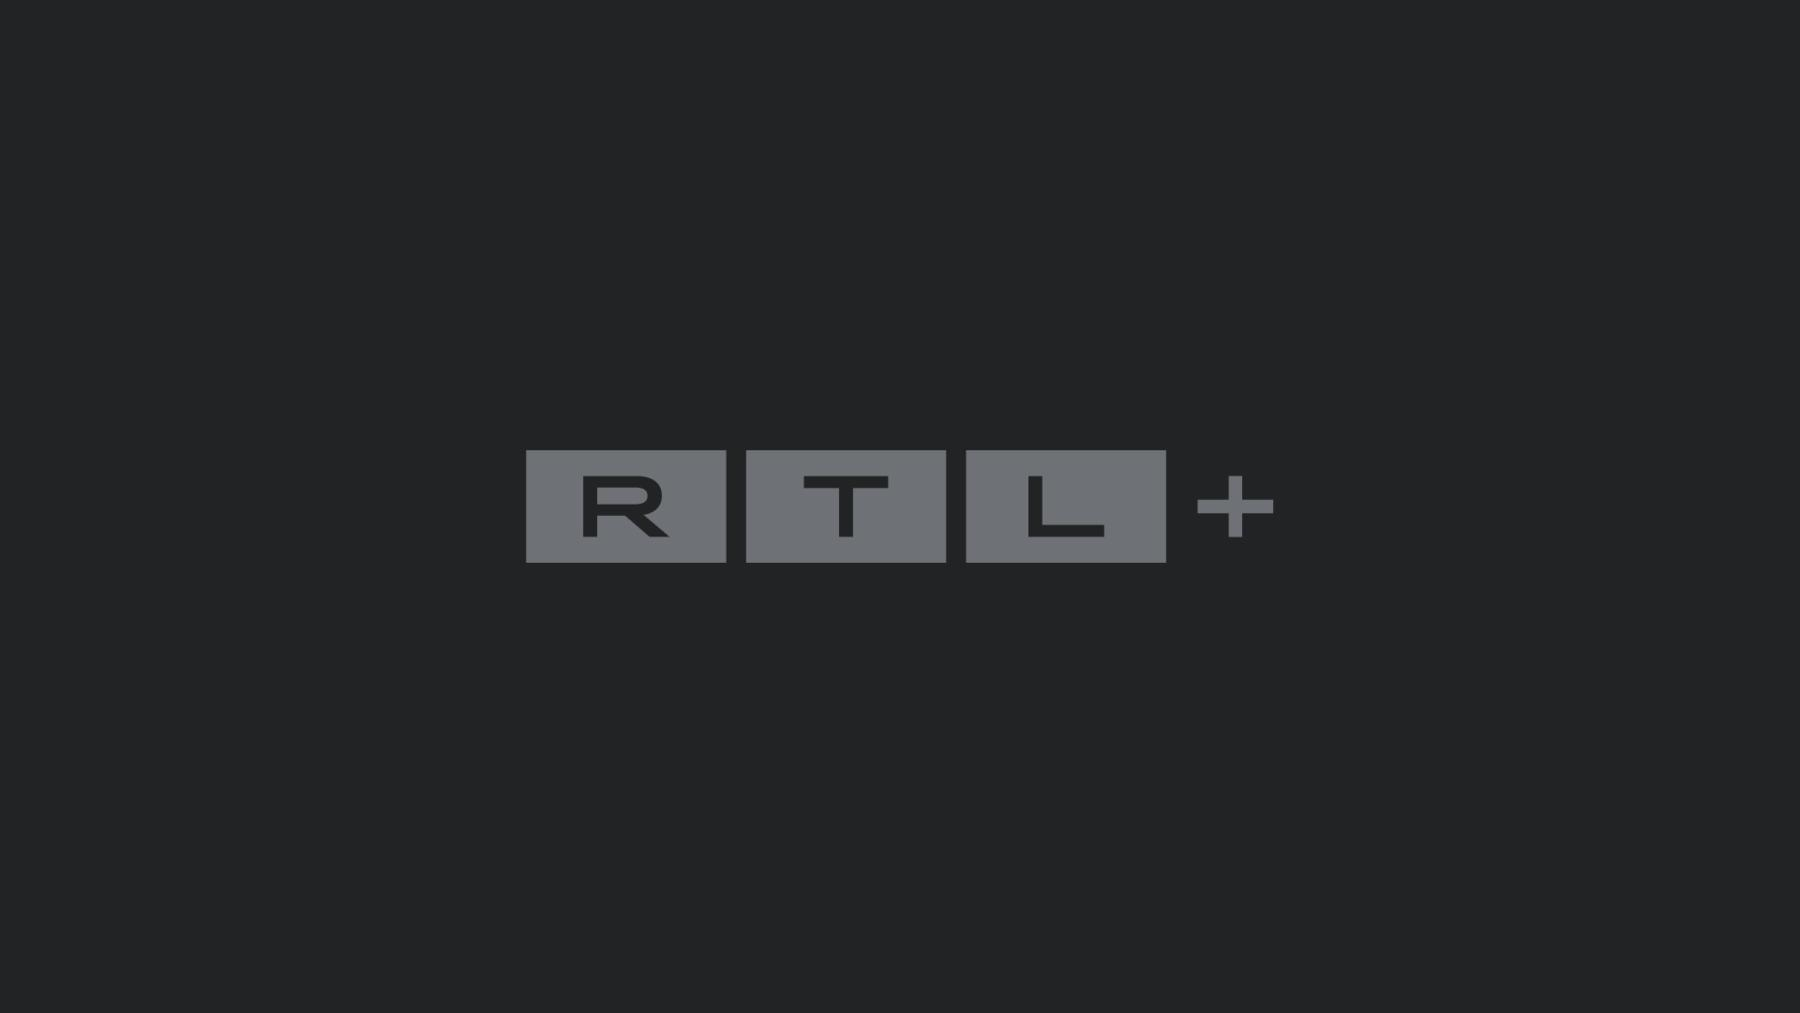 Folge 1 - Daniela ist bei Lanz zu Gast